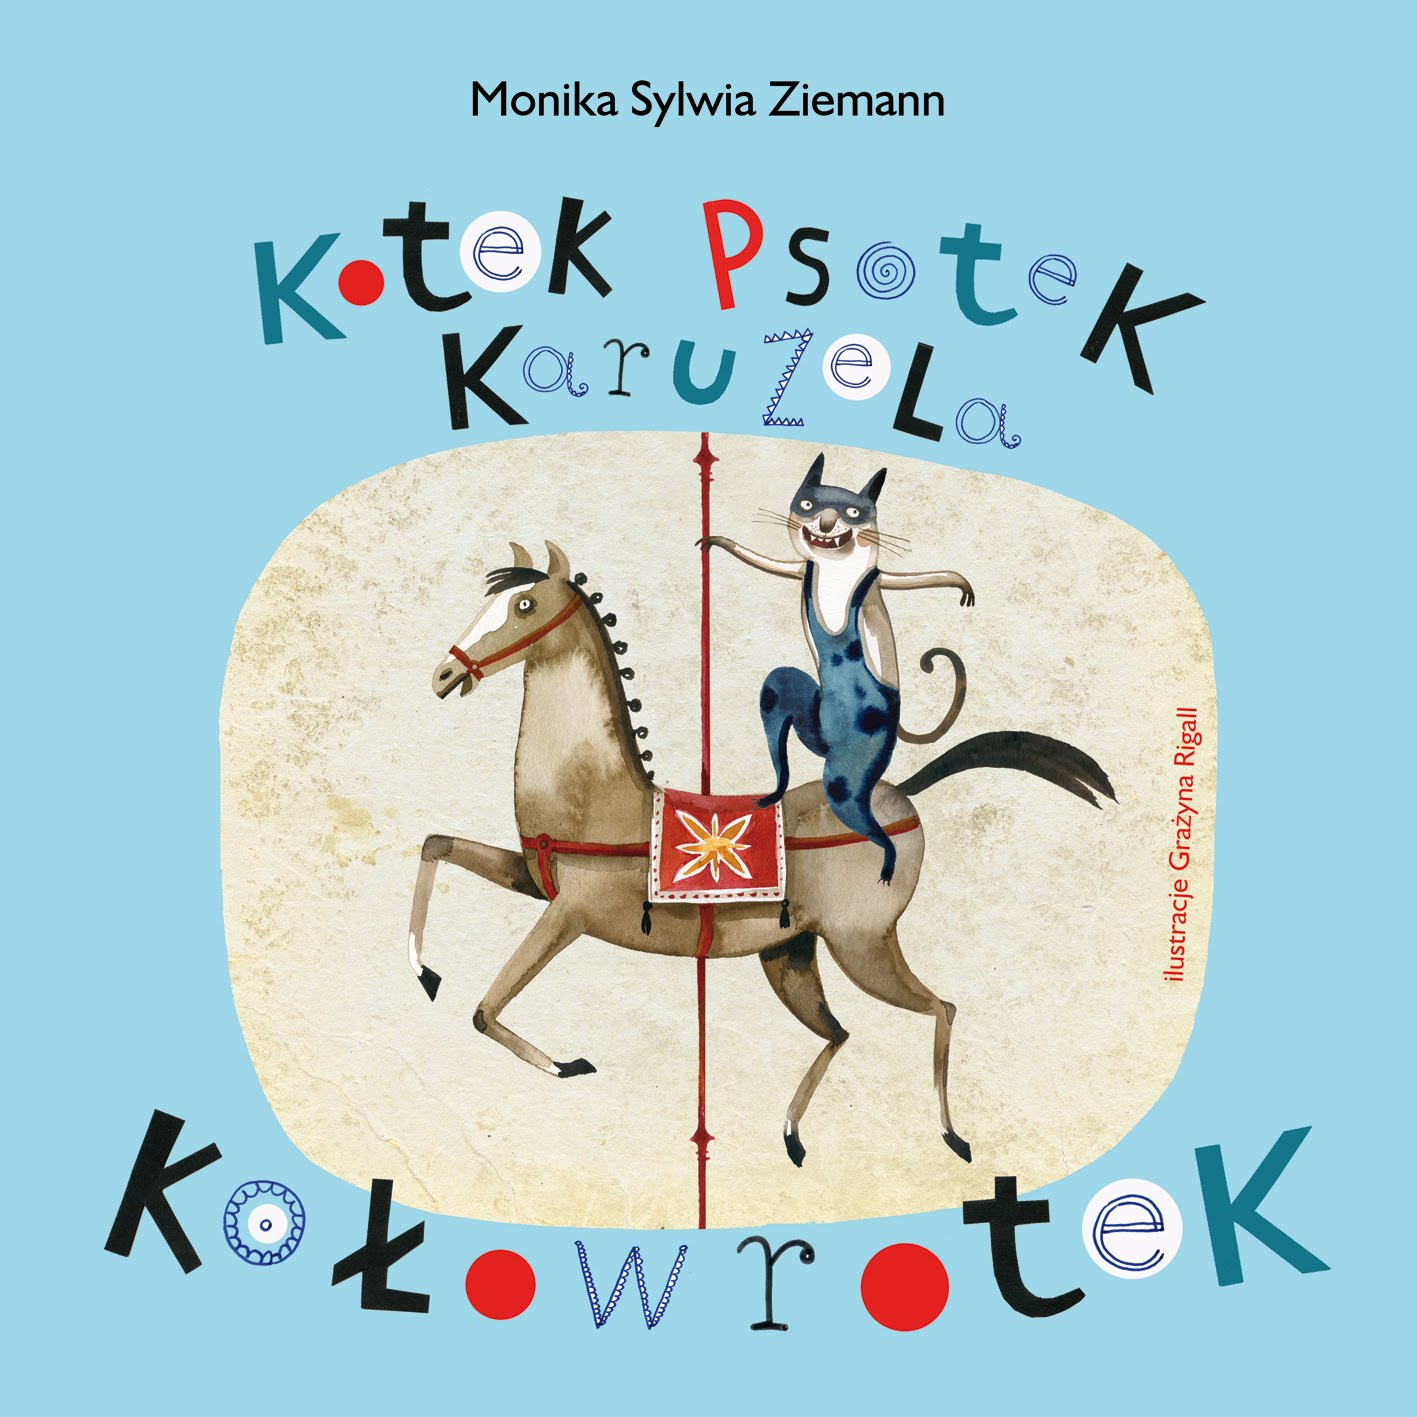 Monika Sylwia Ziemann Kotek Psotek Karuzela Kołowrotek